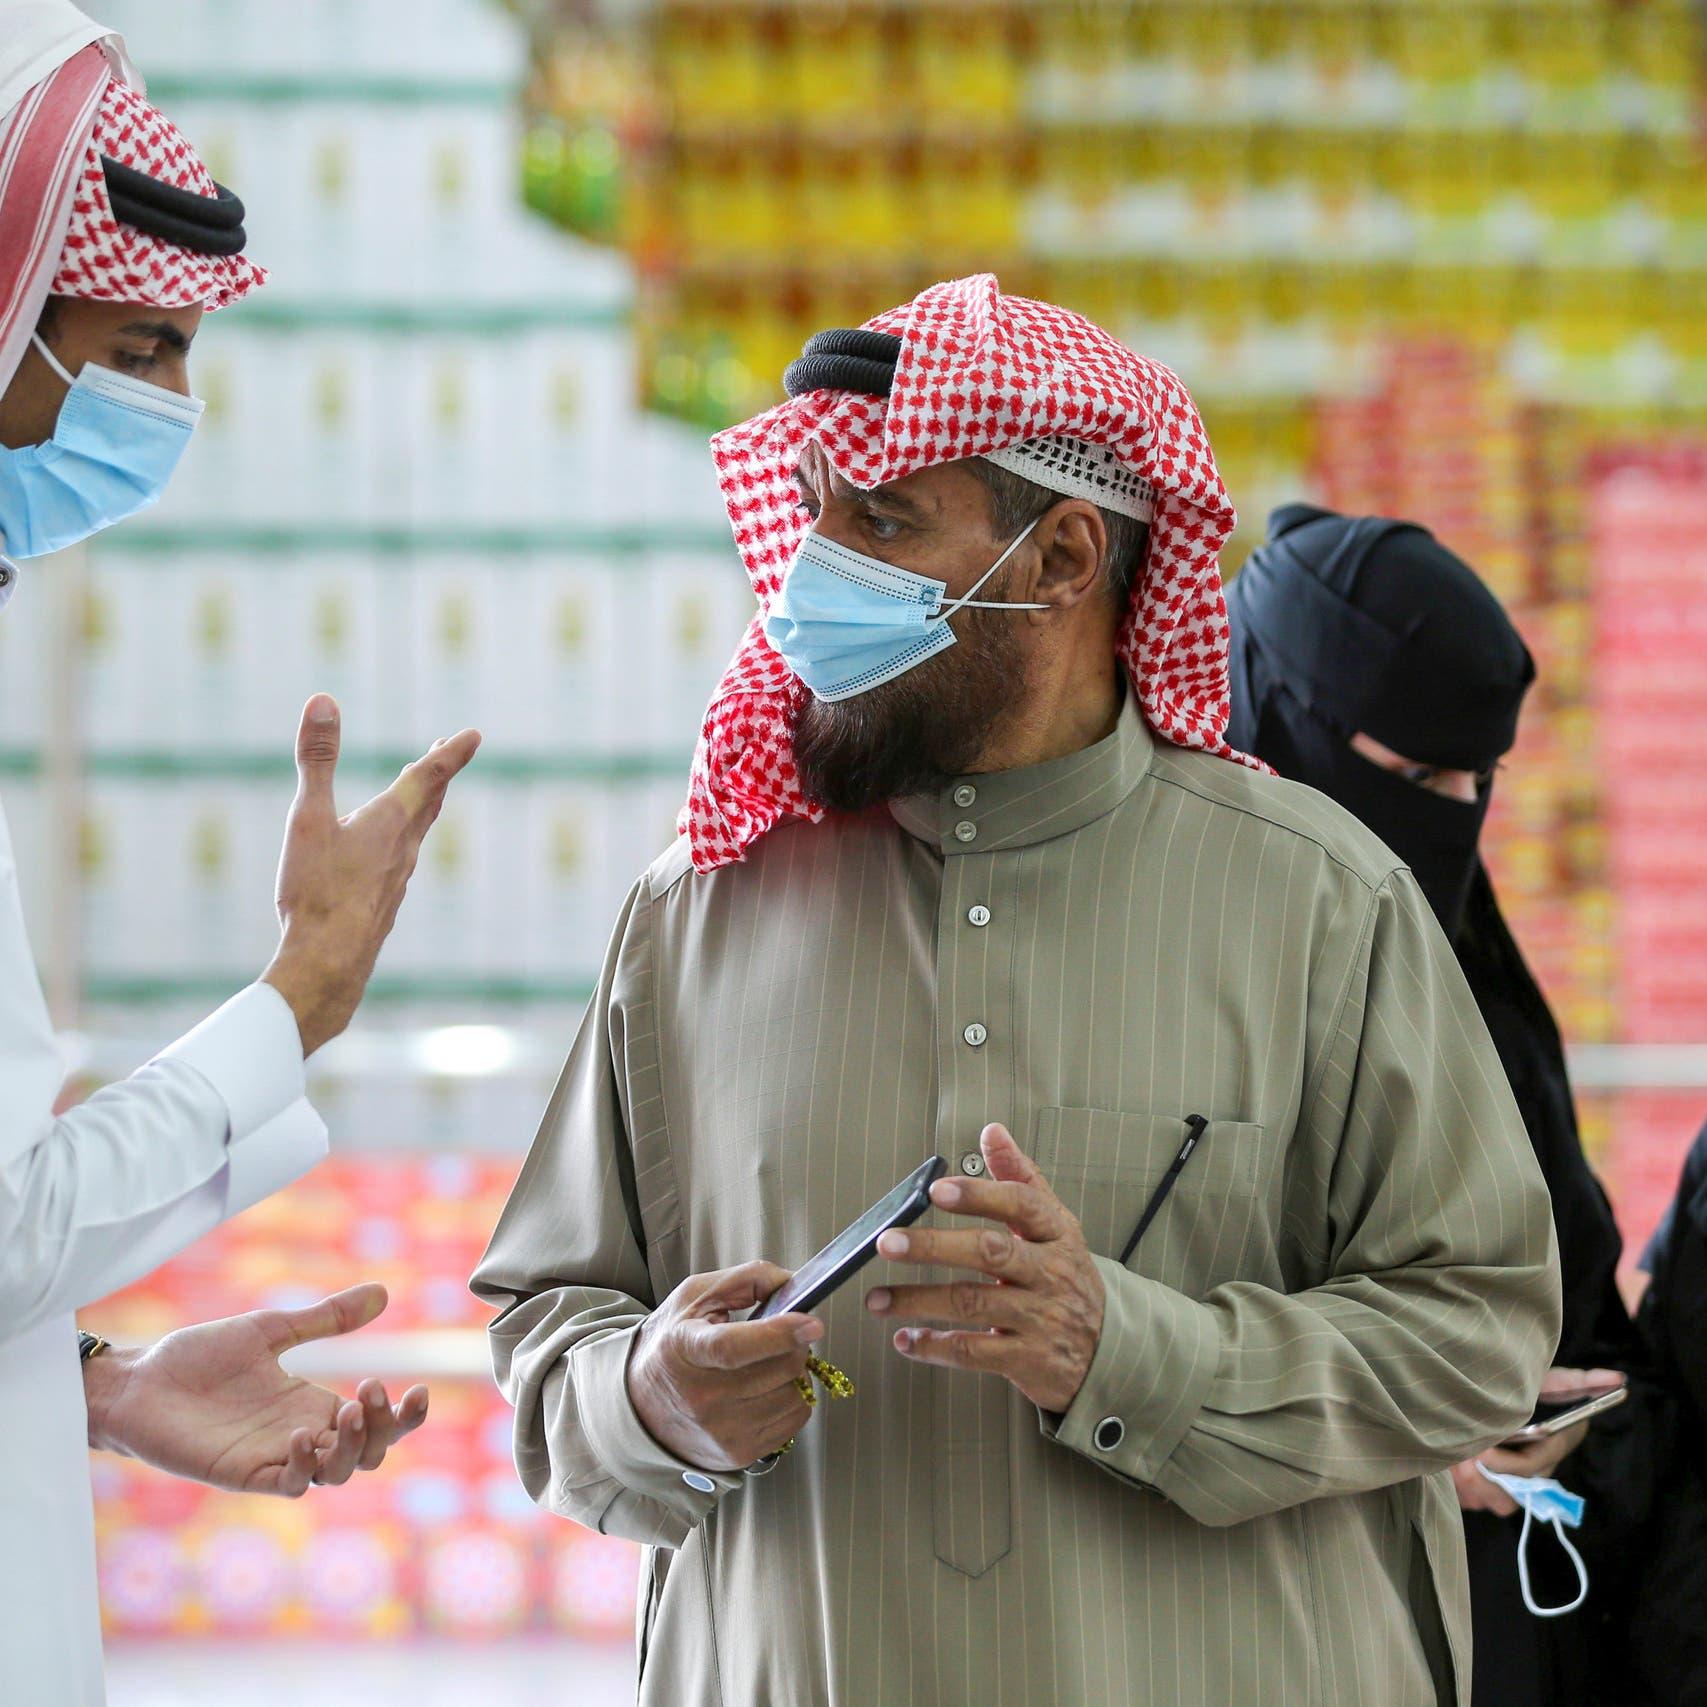 Saudi Arabia reports 1,379 new COVID-19 cases, 10 deaths